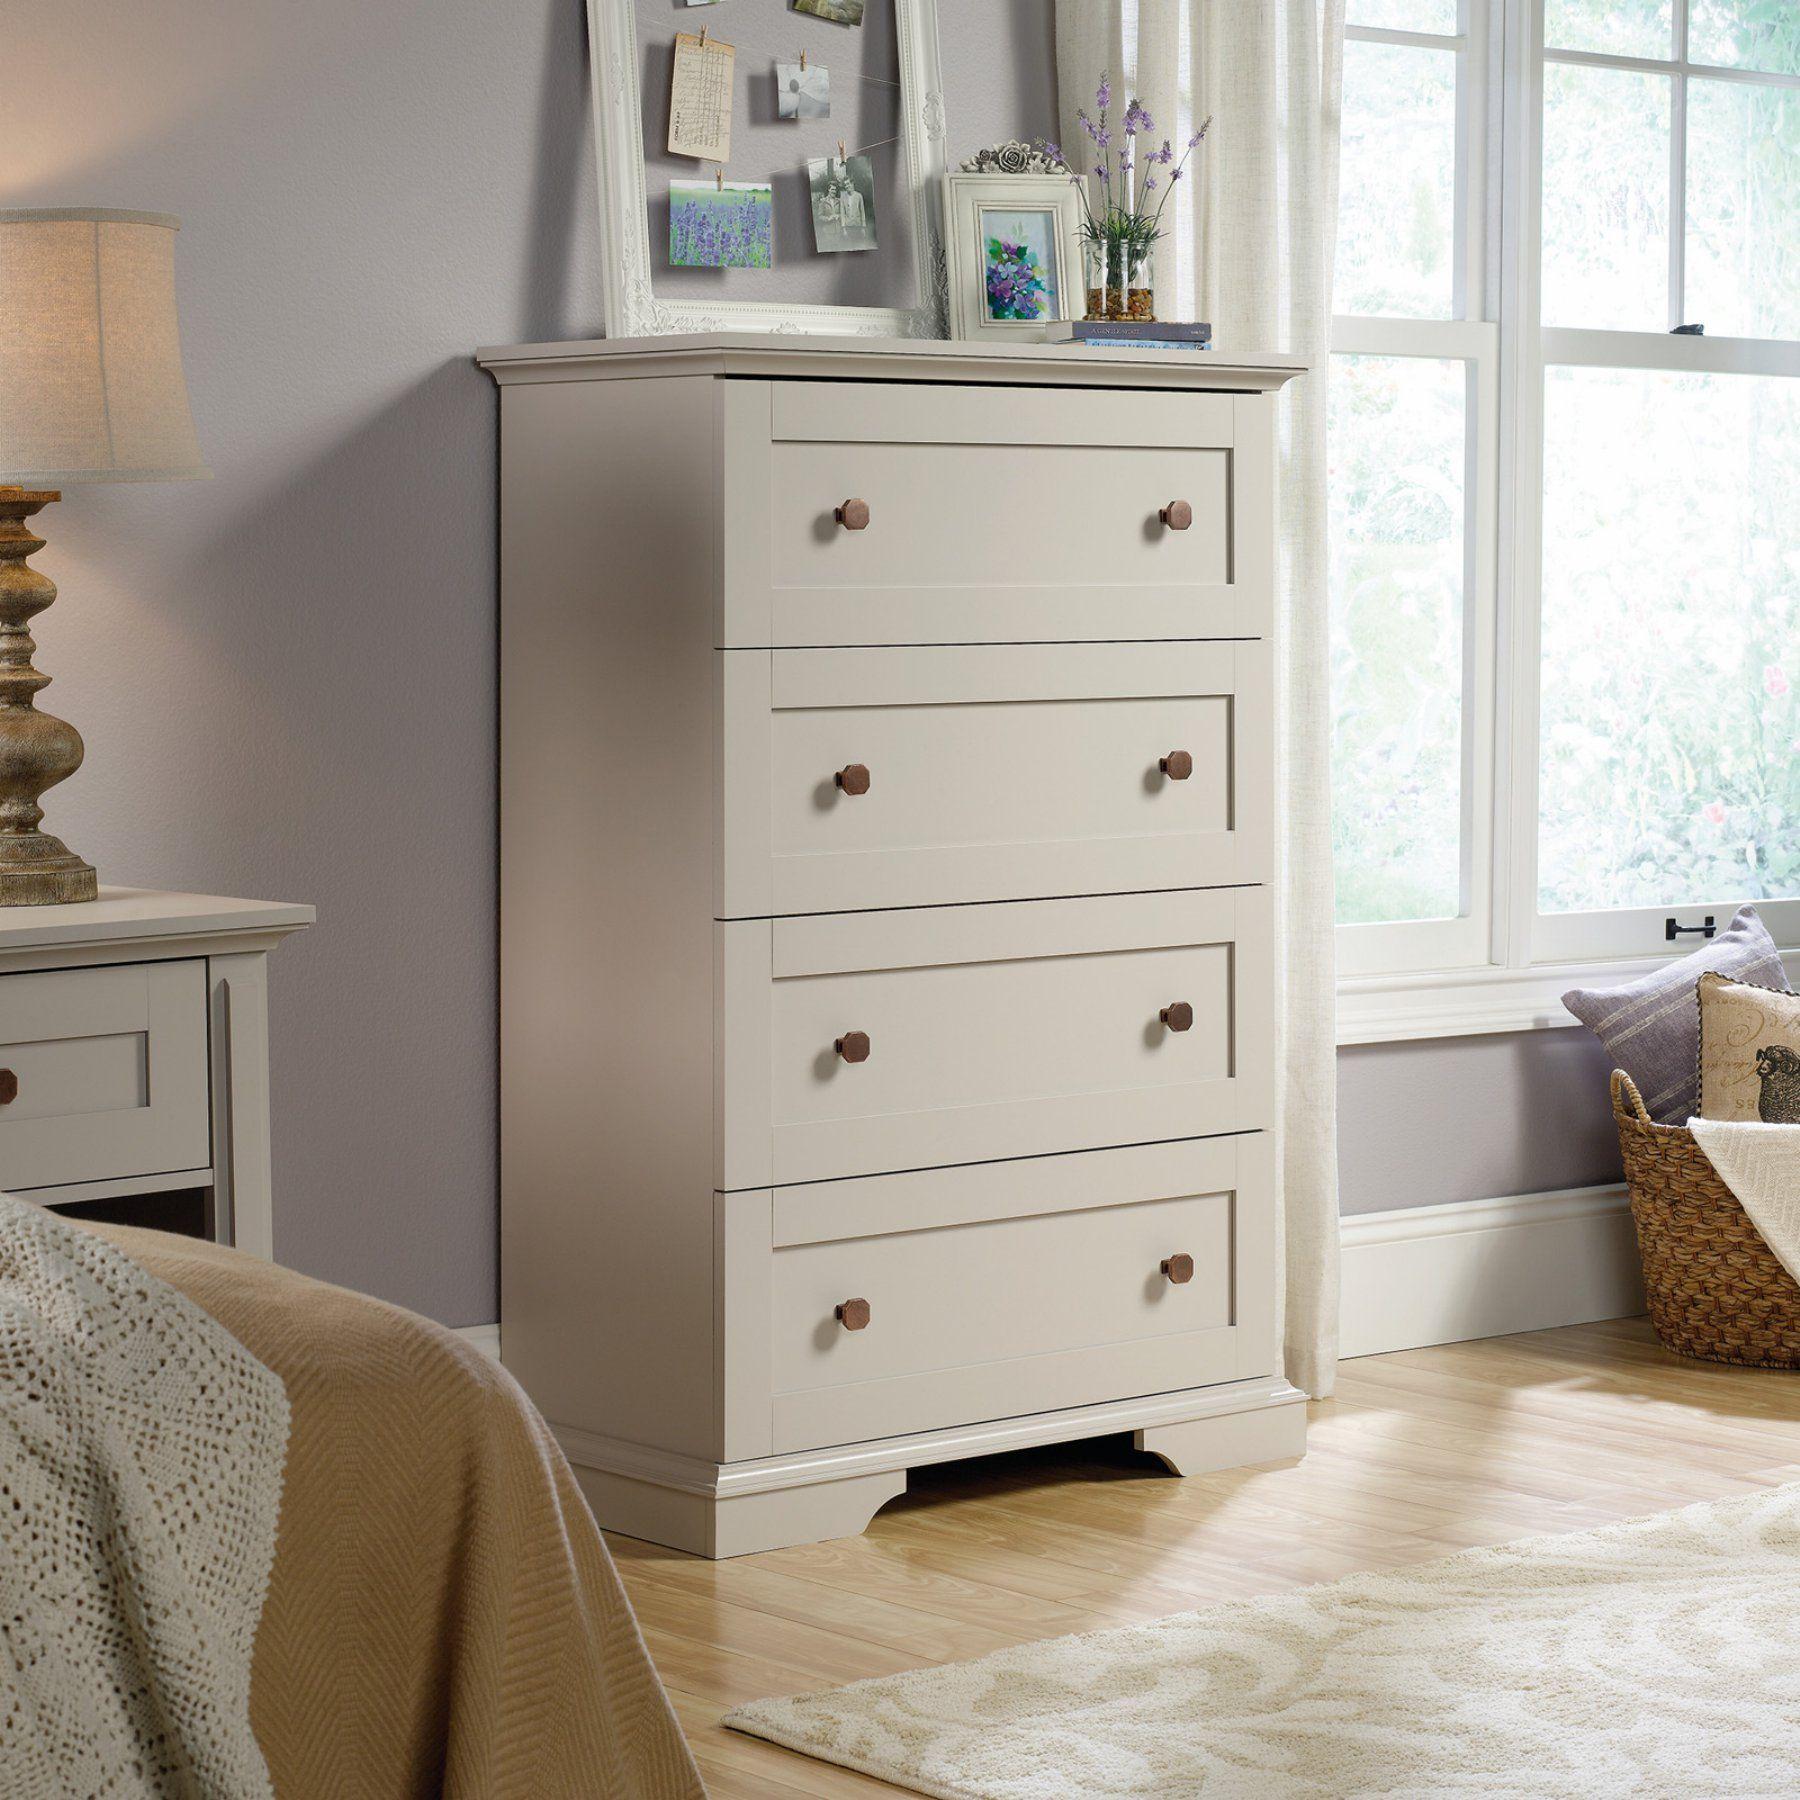 Sauder new grange drawer chest products